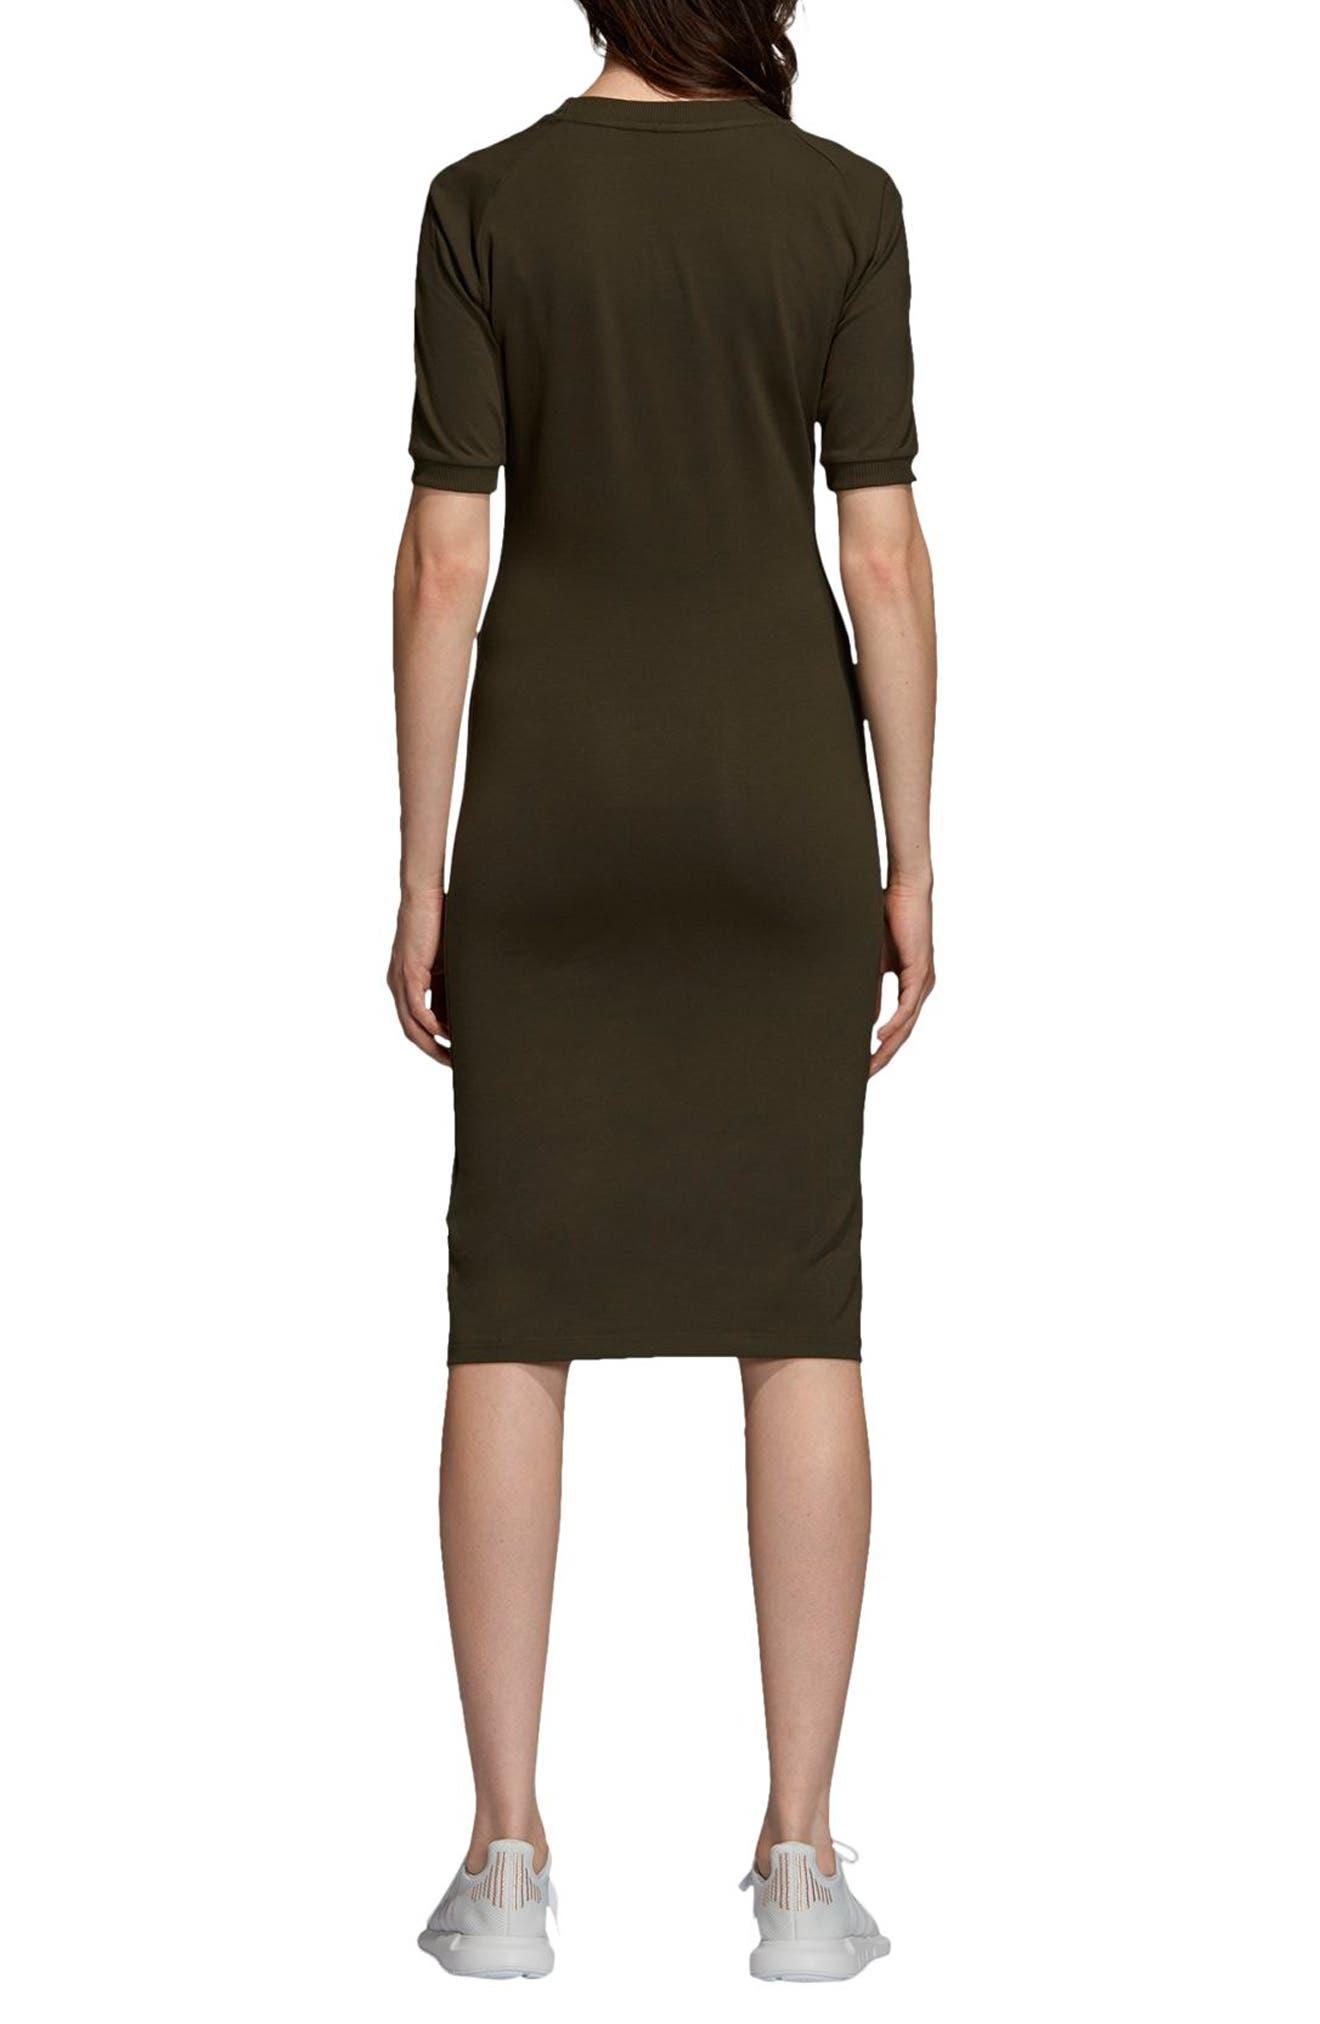 adidas 3-Stripes Dress,                             Alternate thumbnail 2, color,                             NIGHT CARGO